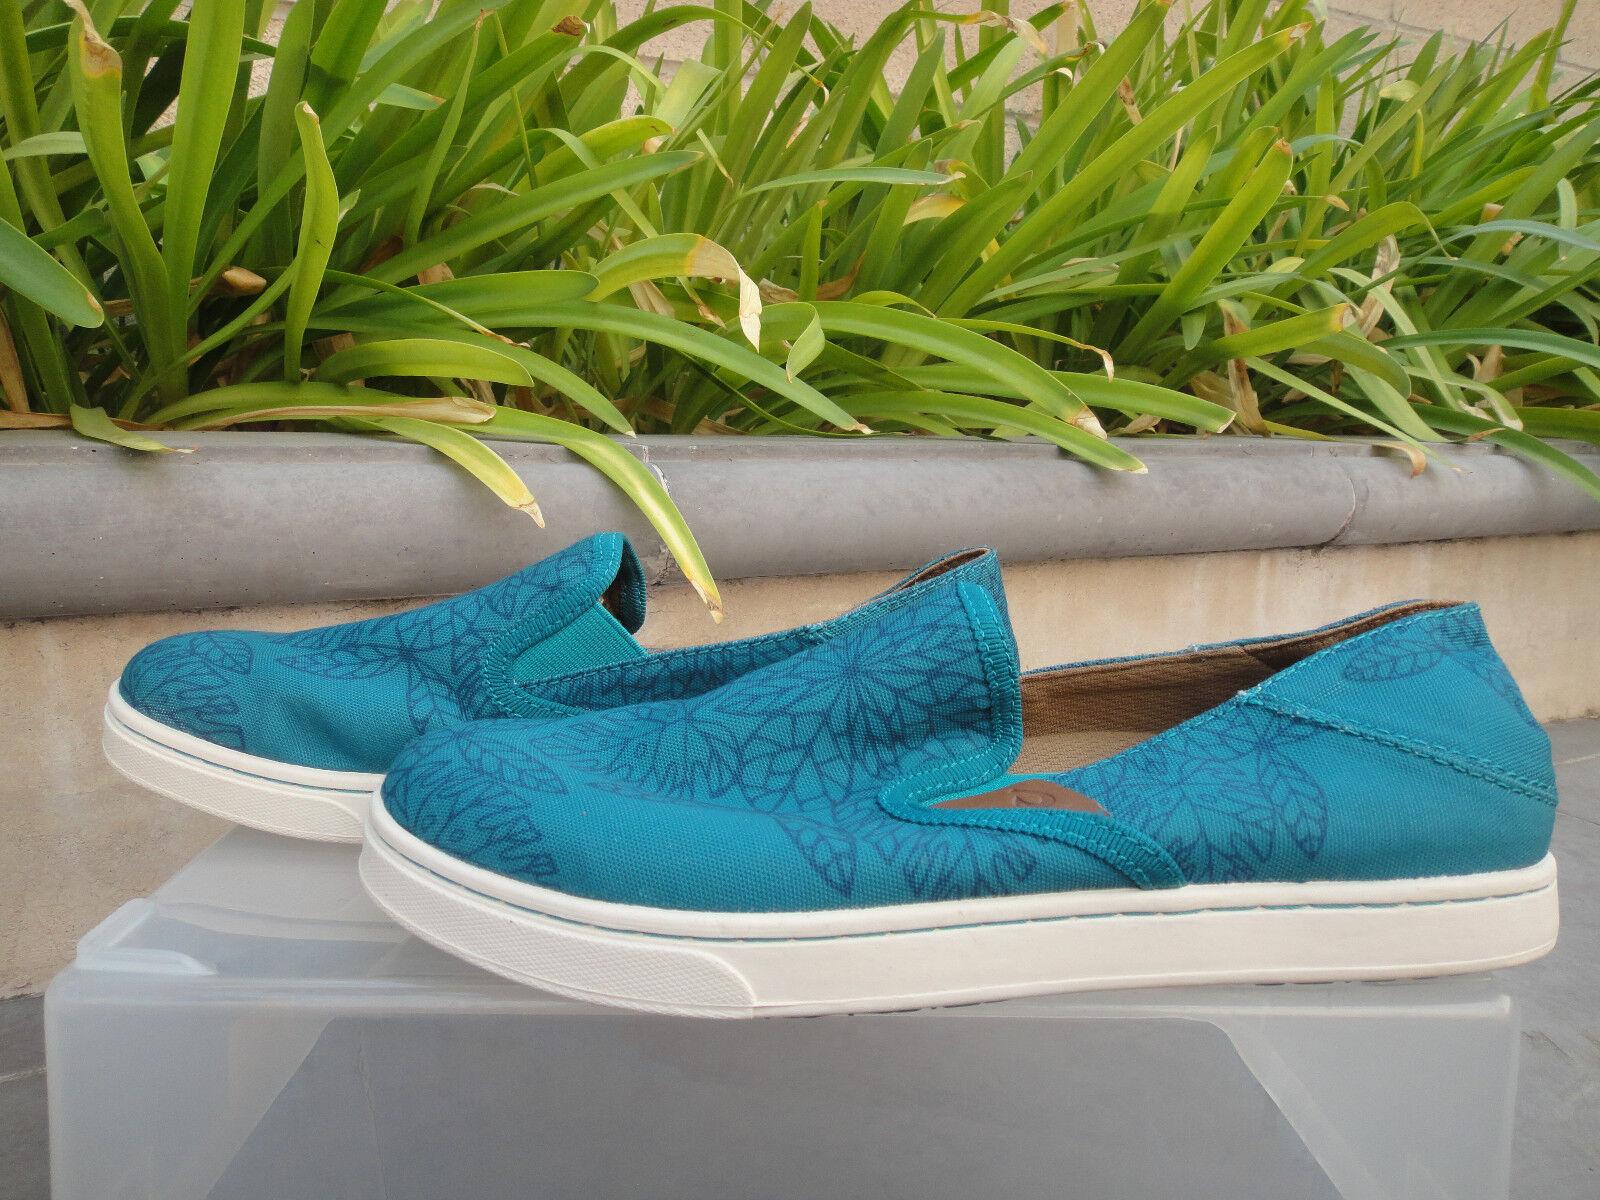 Olukai PEHUEA POW  WOW  Teal Legion Blau Textile, Wmn's Größe US7 MSRP 100